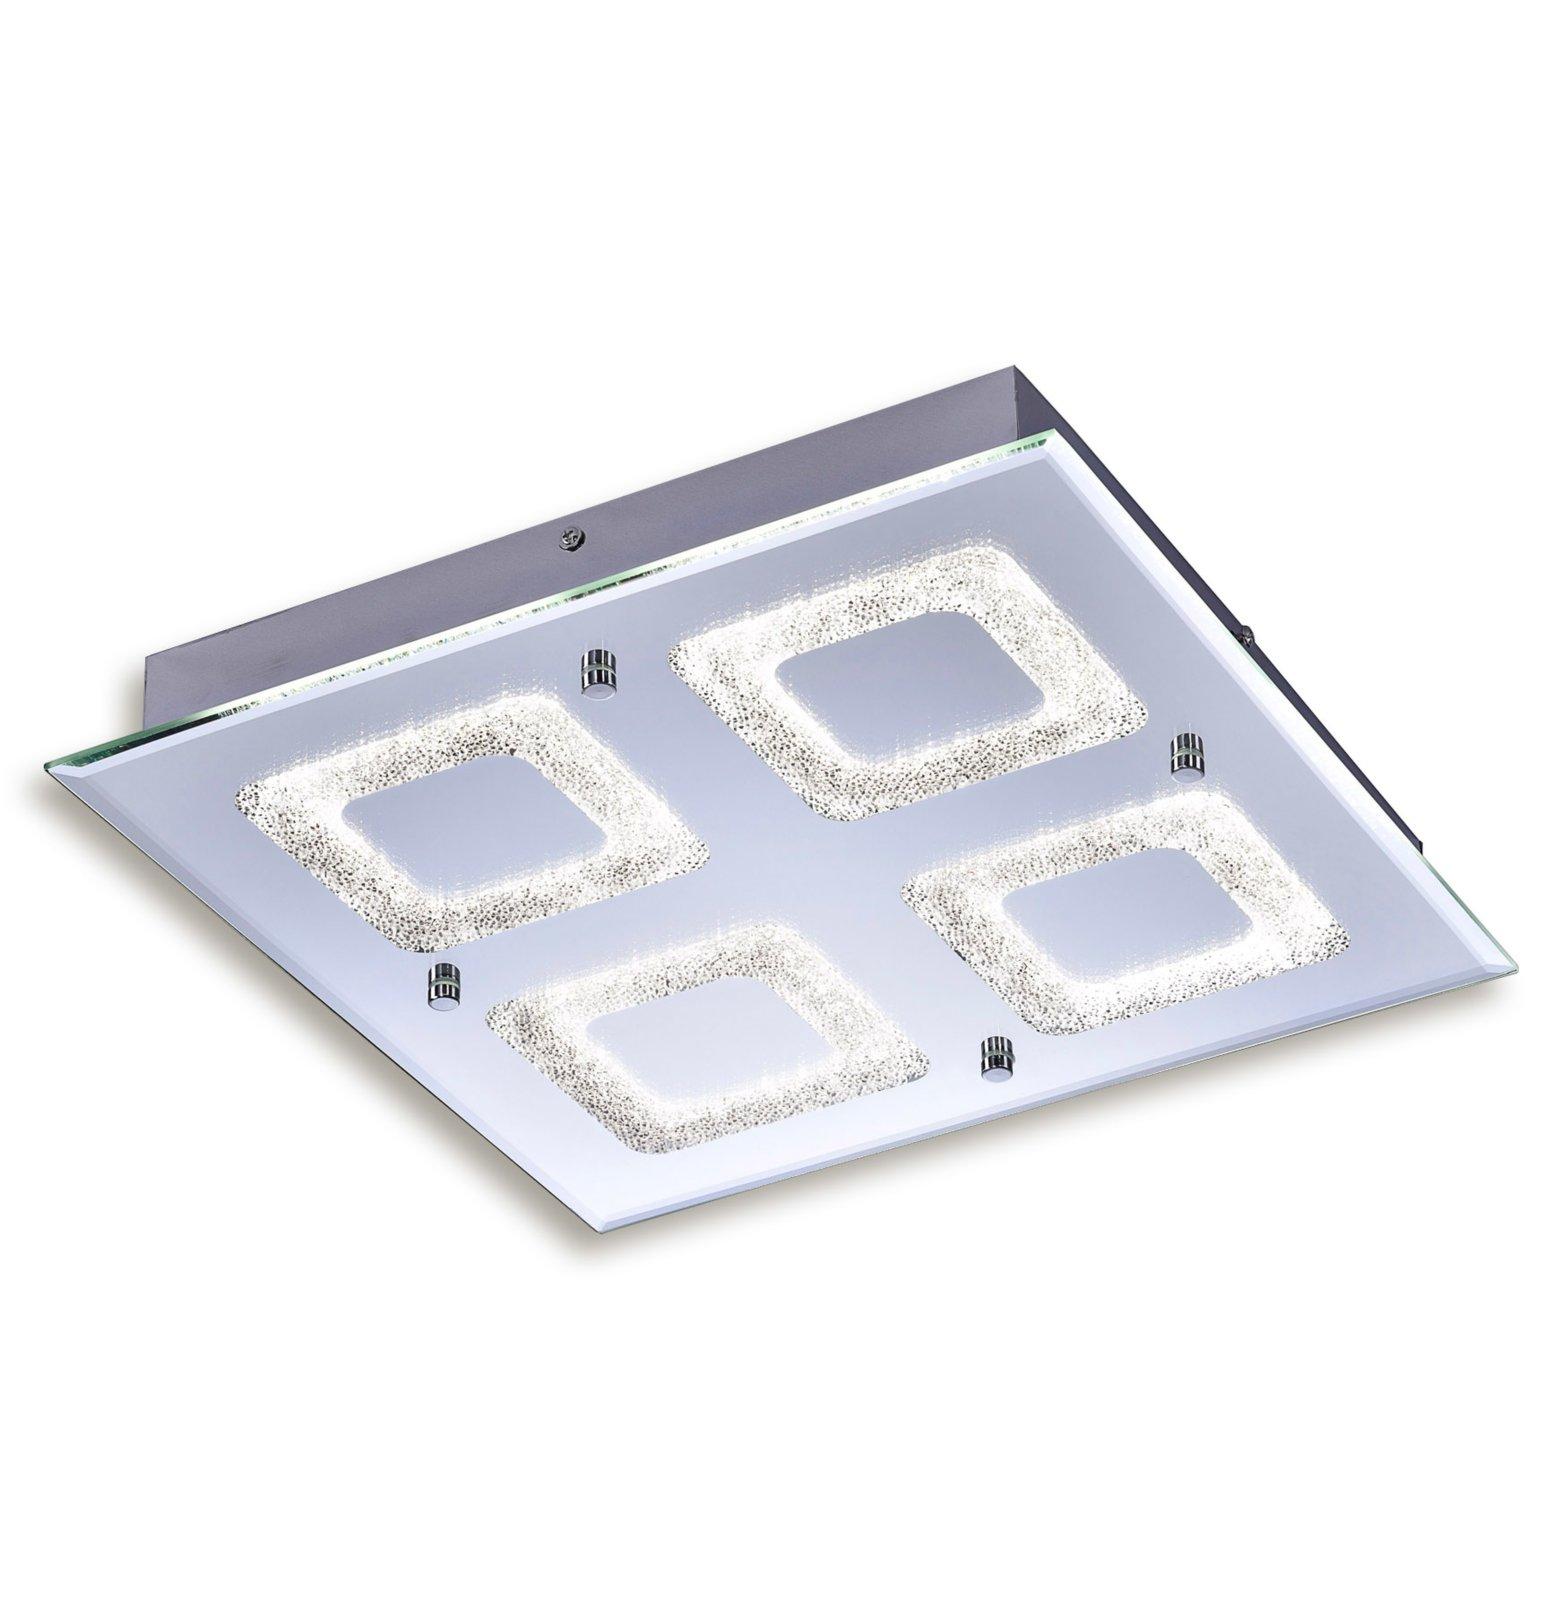 led deckenleuchte lisa chrom glas 36x36 cm led deckenleuchten deckenleuchten lampen. Black Bedroom Furniture Sets. Home Design Ideas